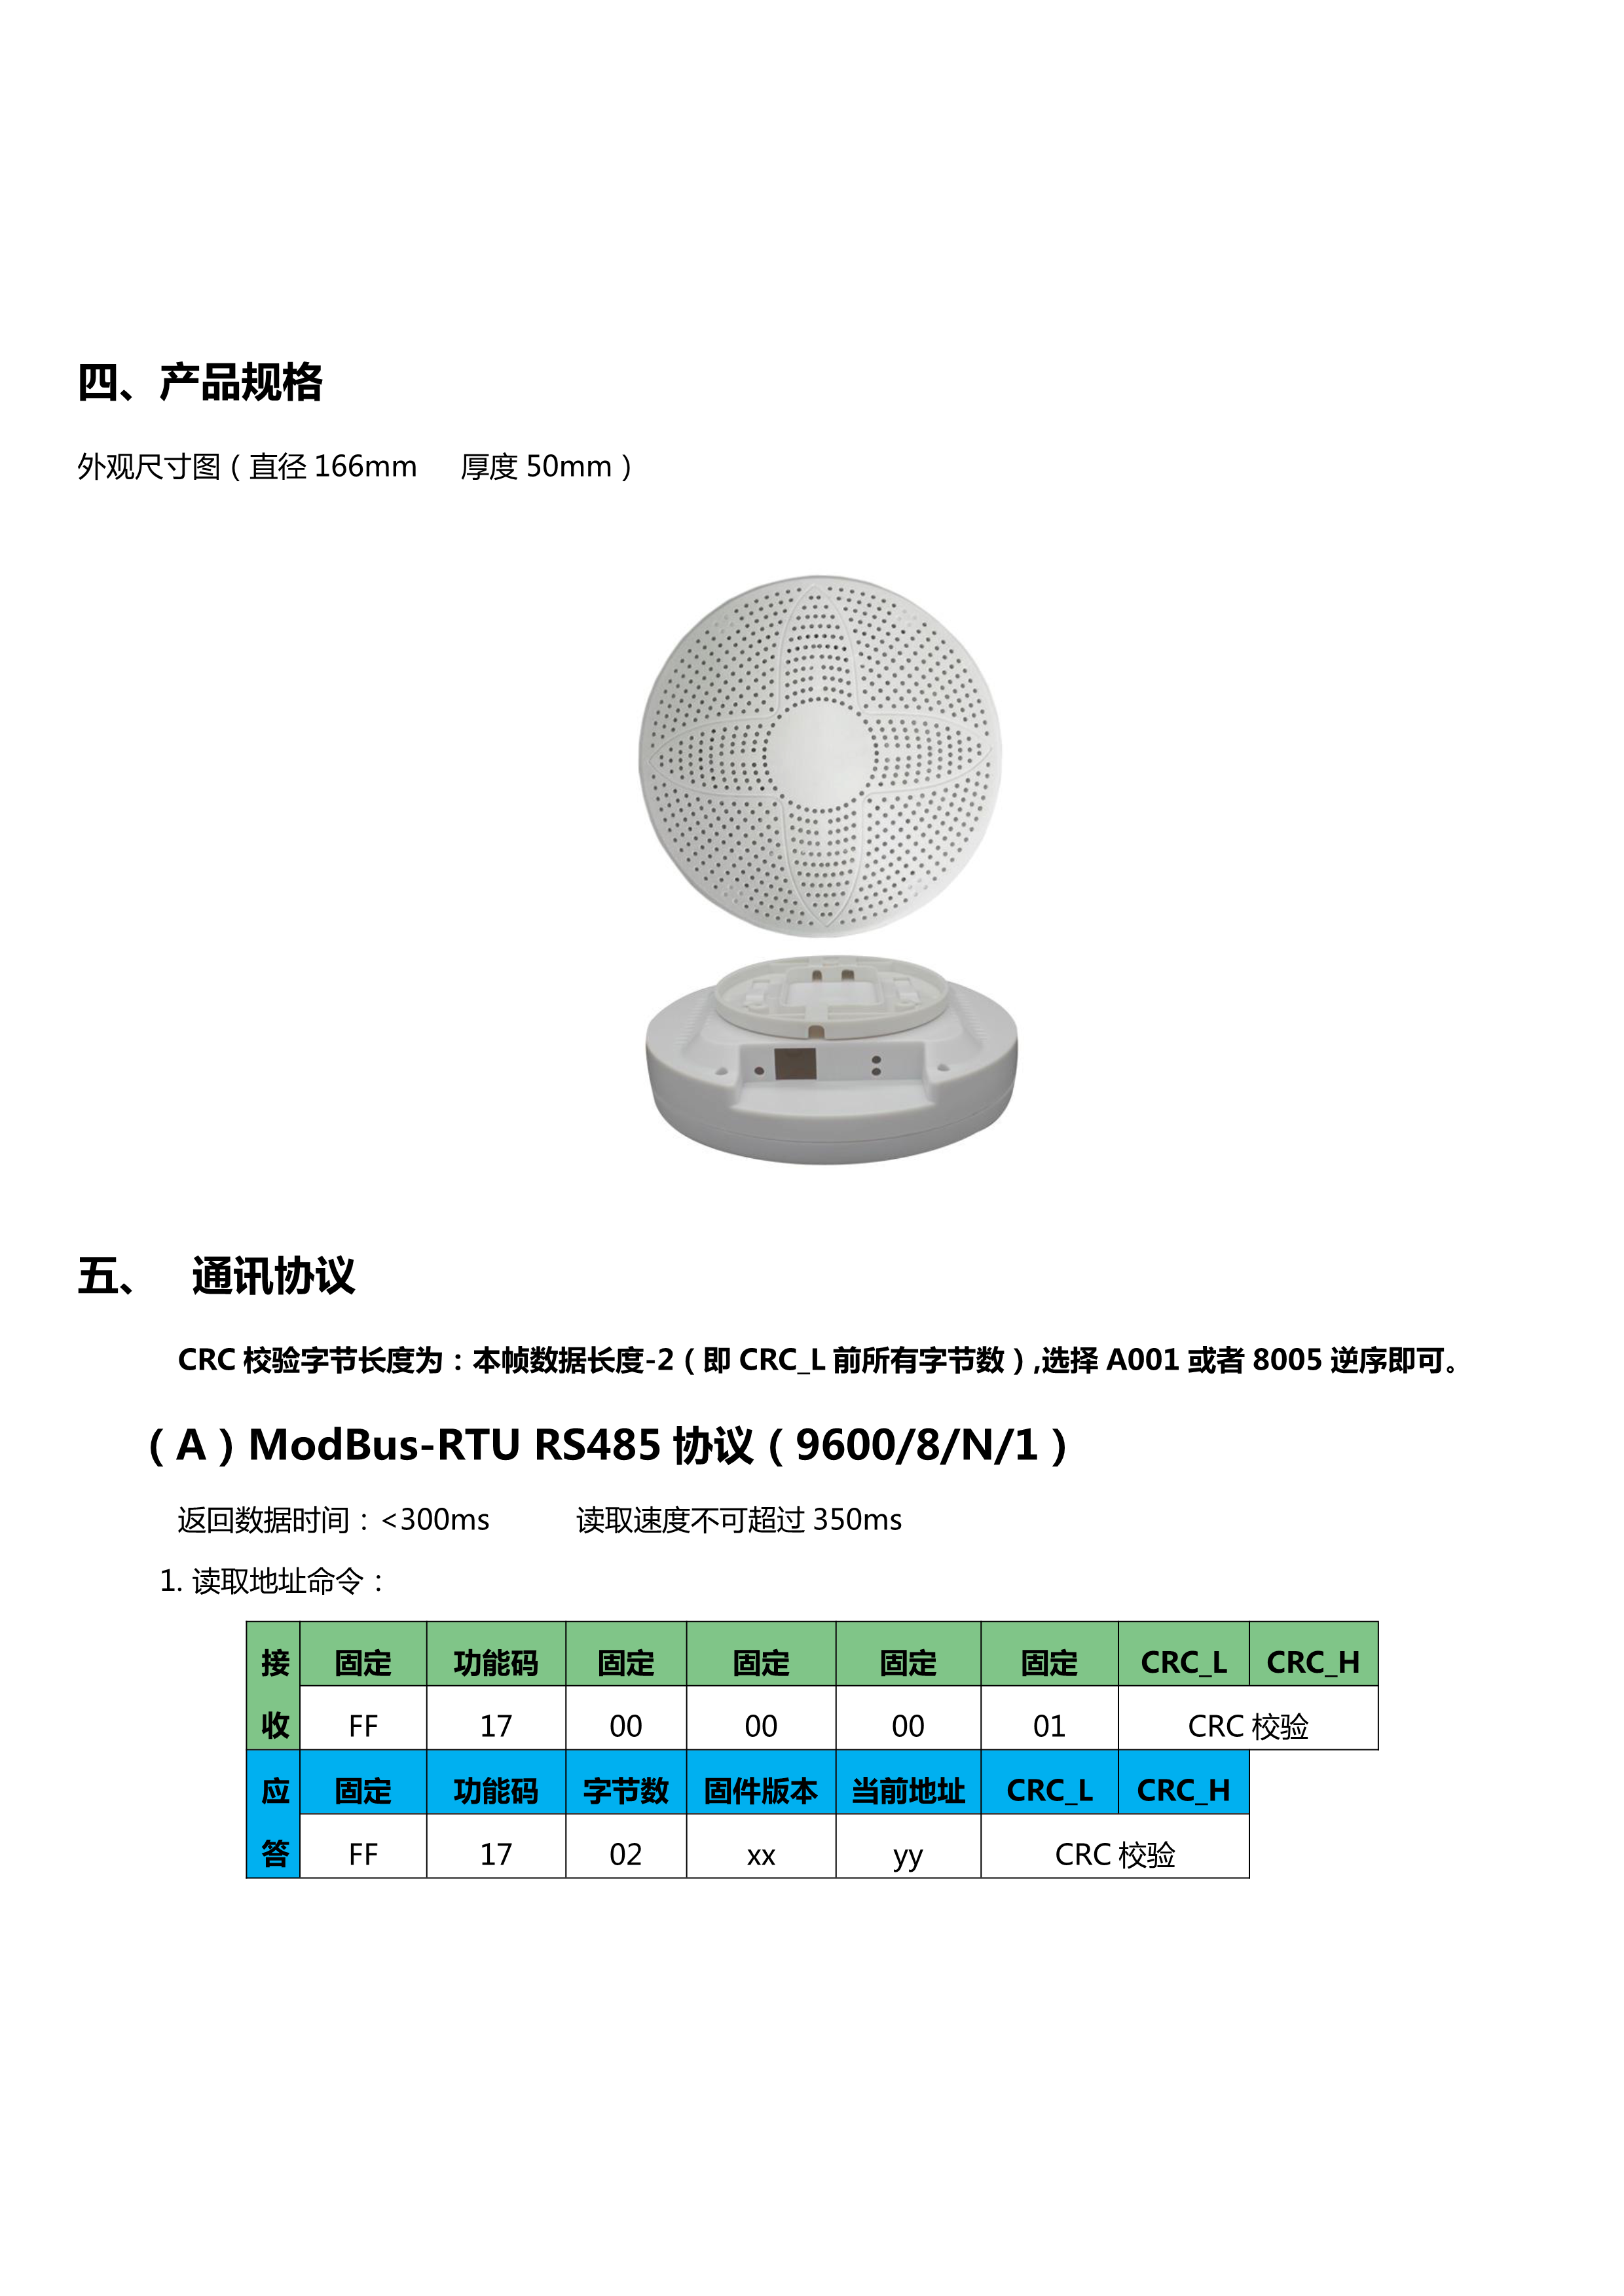 CRK-X6吸頂式環境監測設備說明書V1.0_5.png